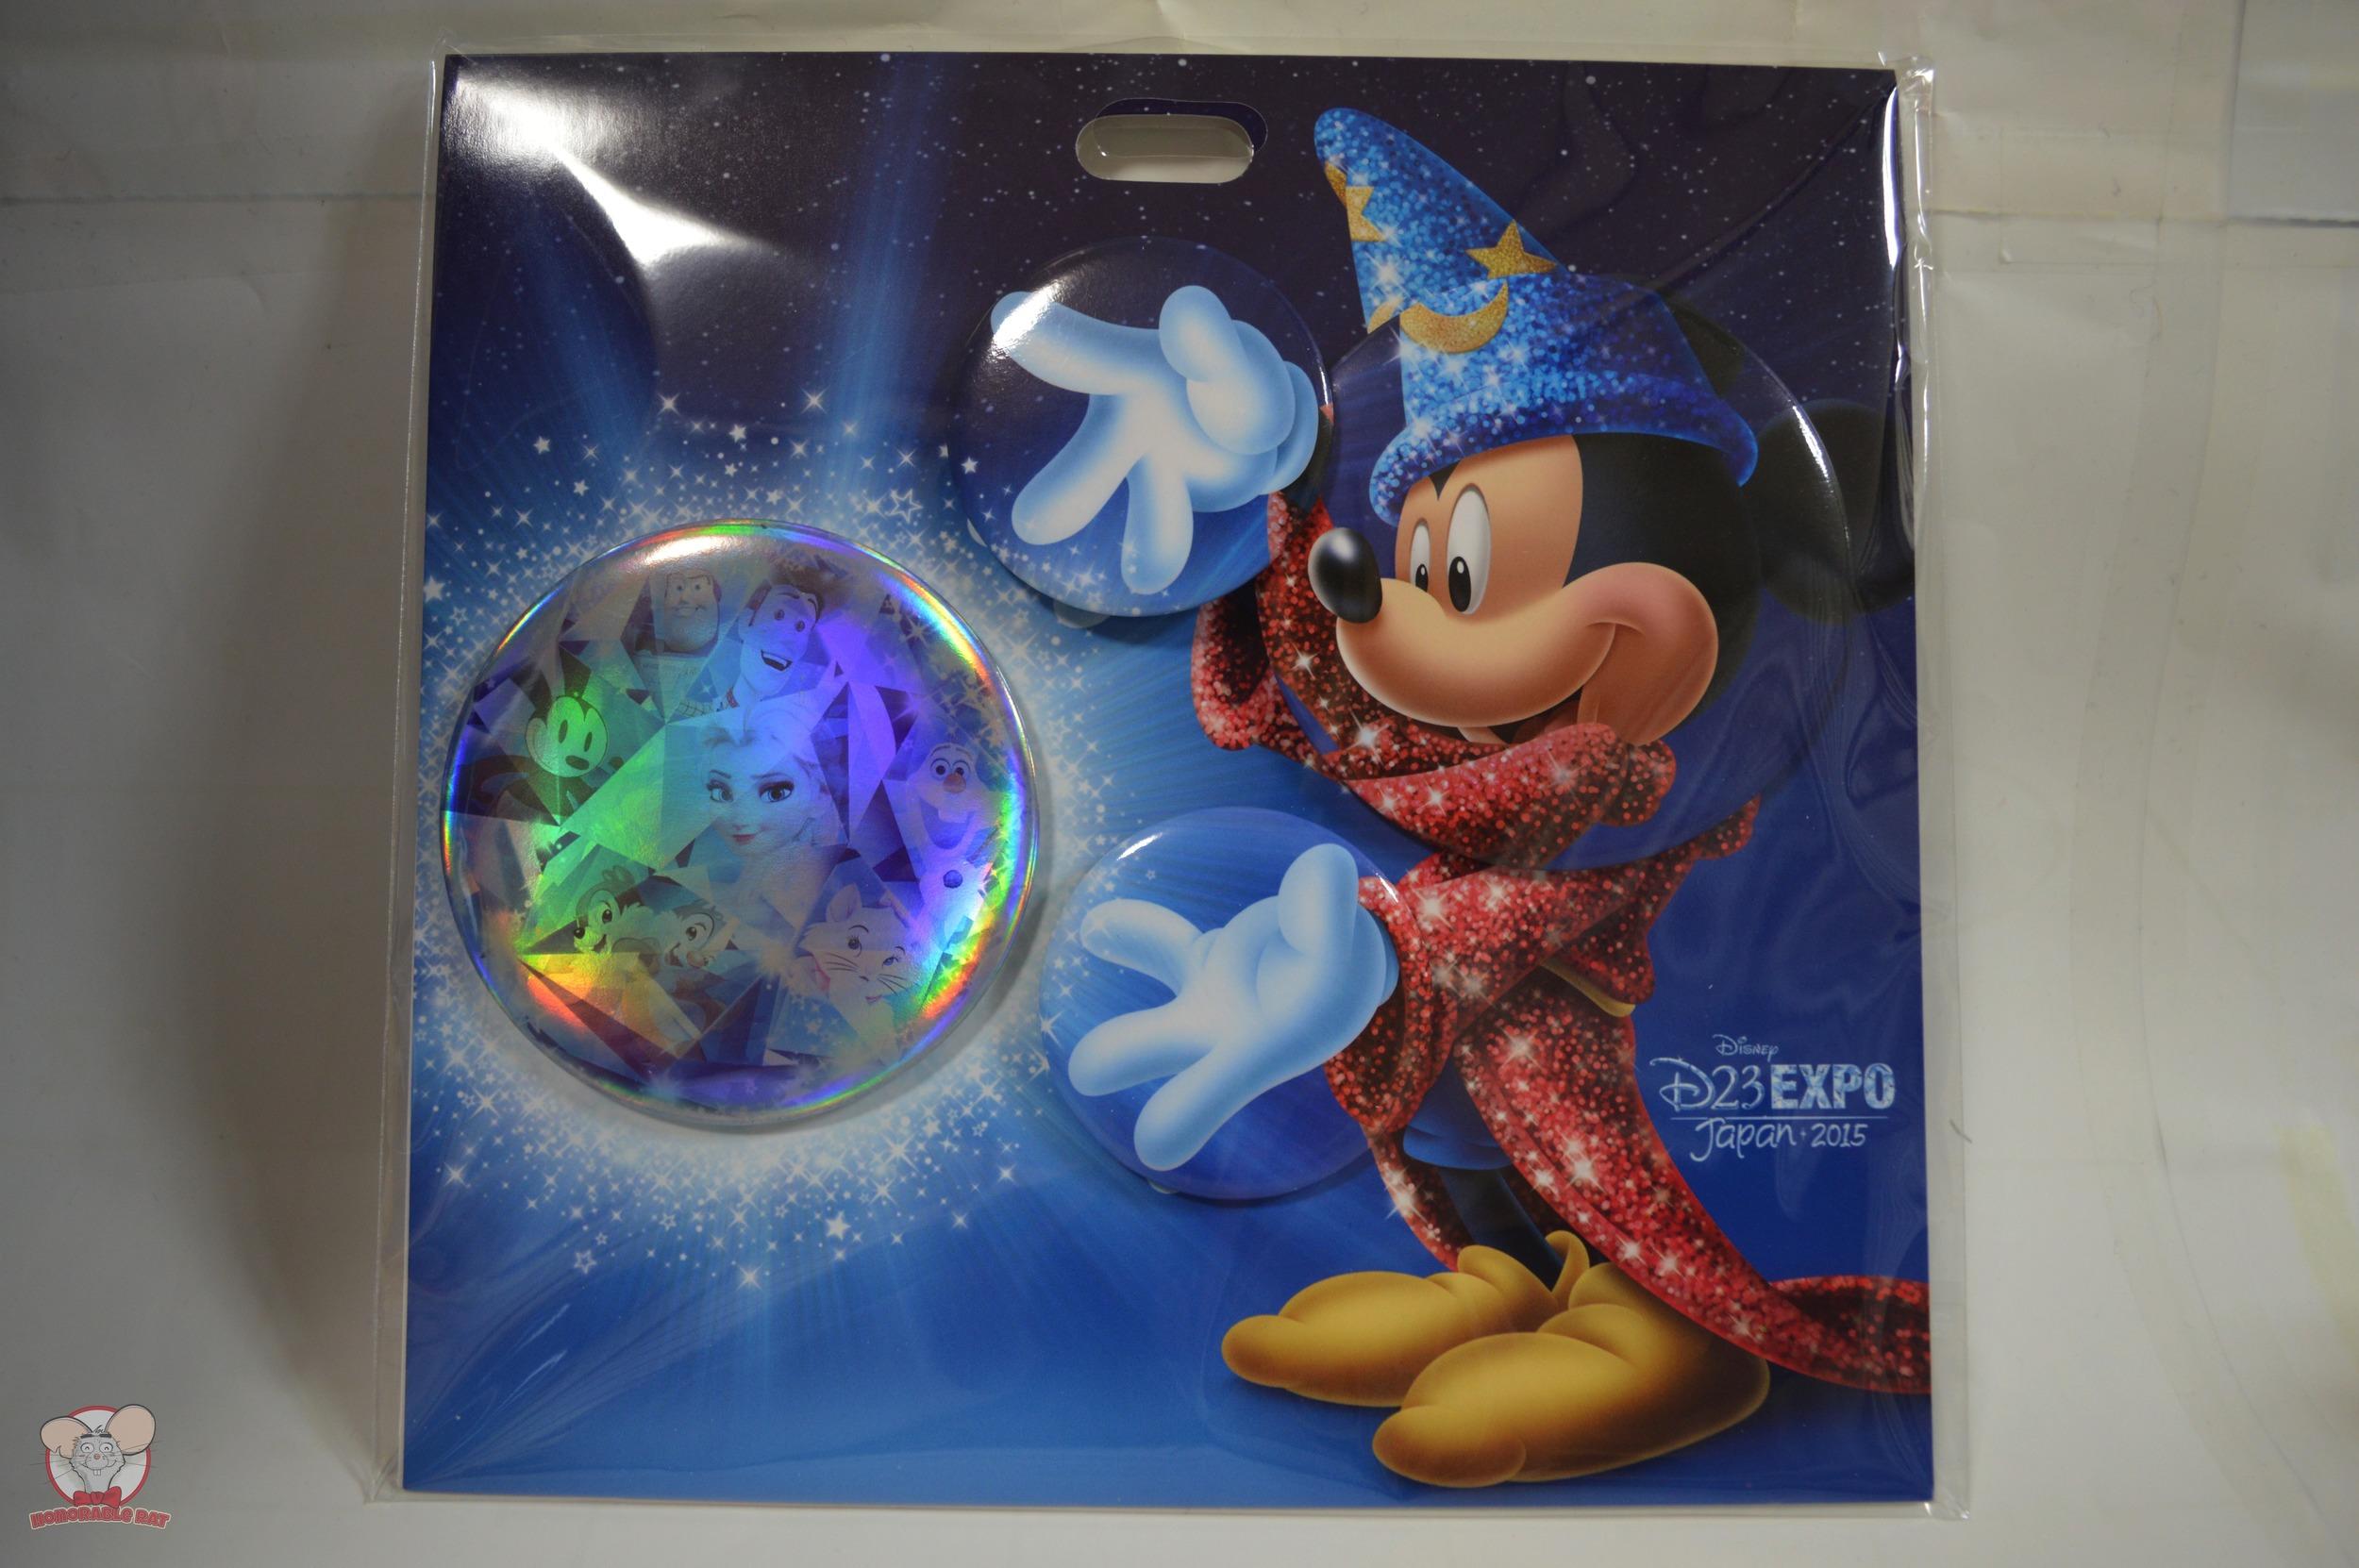 D23 Expo Japan 2015 Set of 4 Button Badges